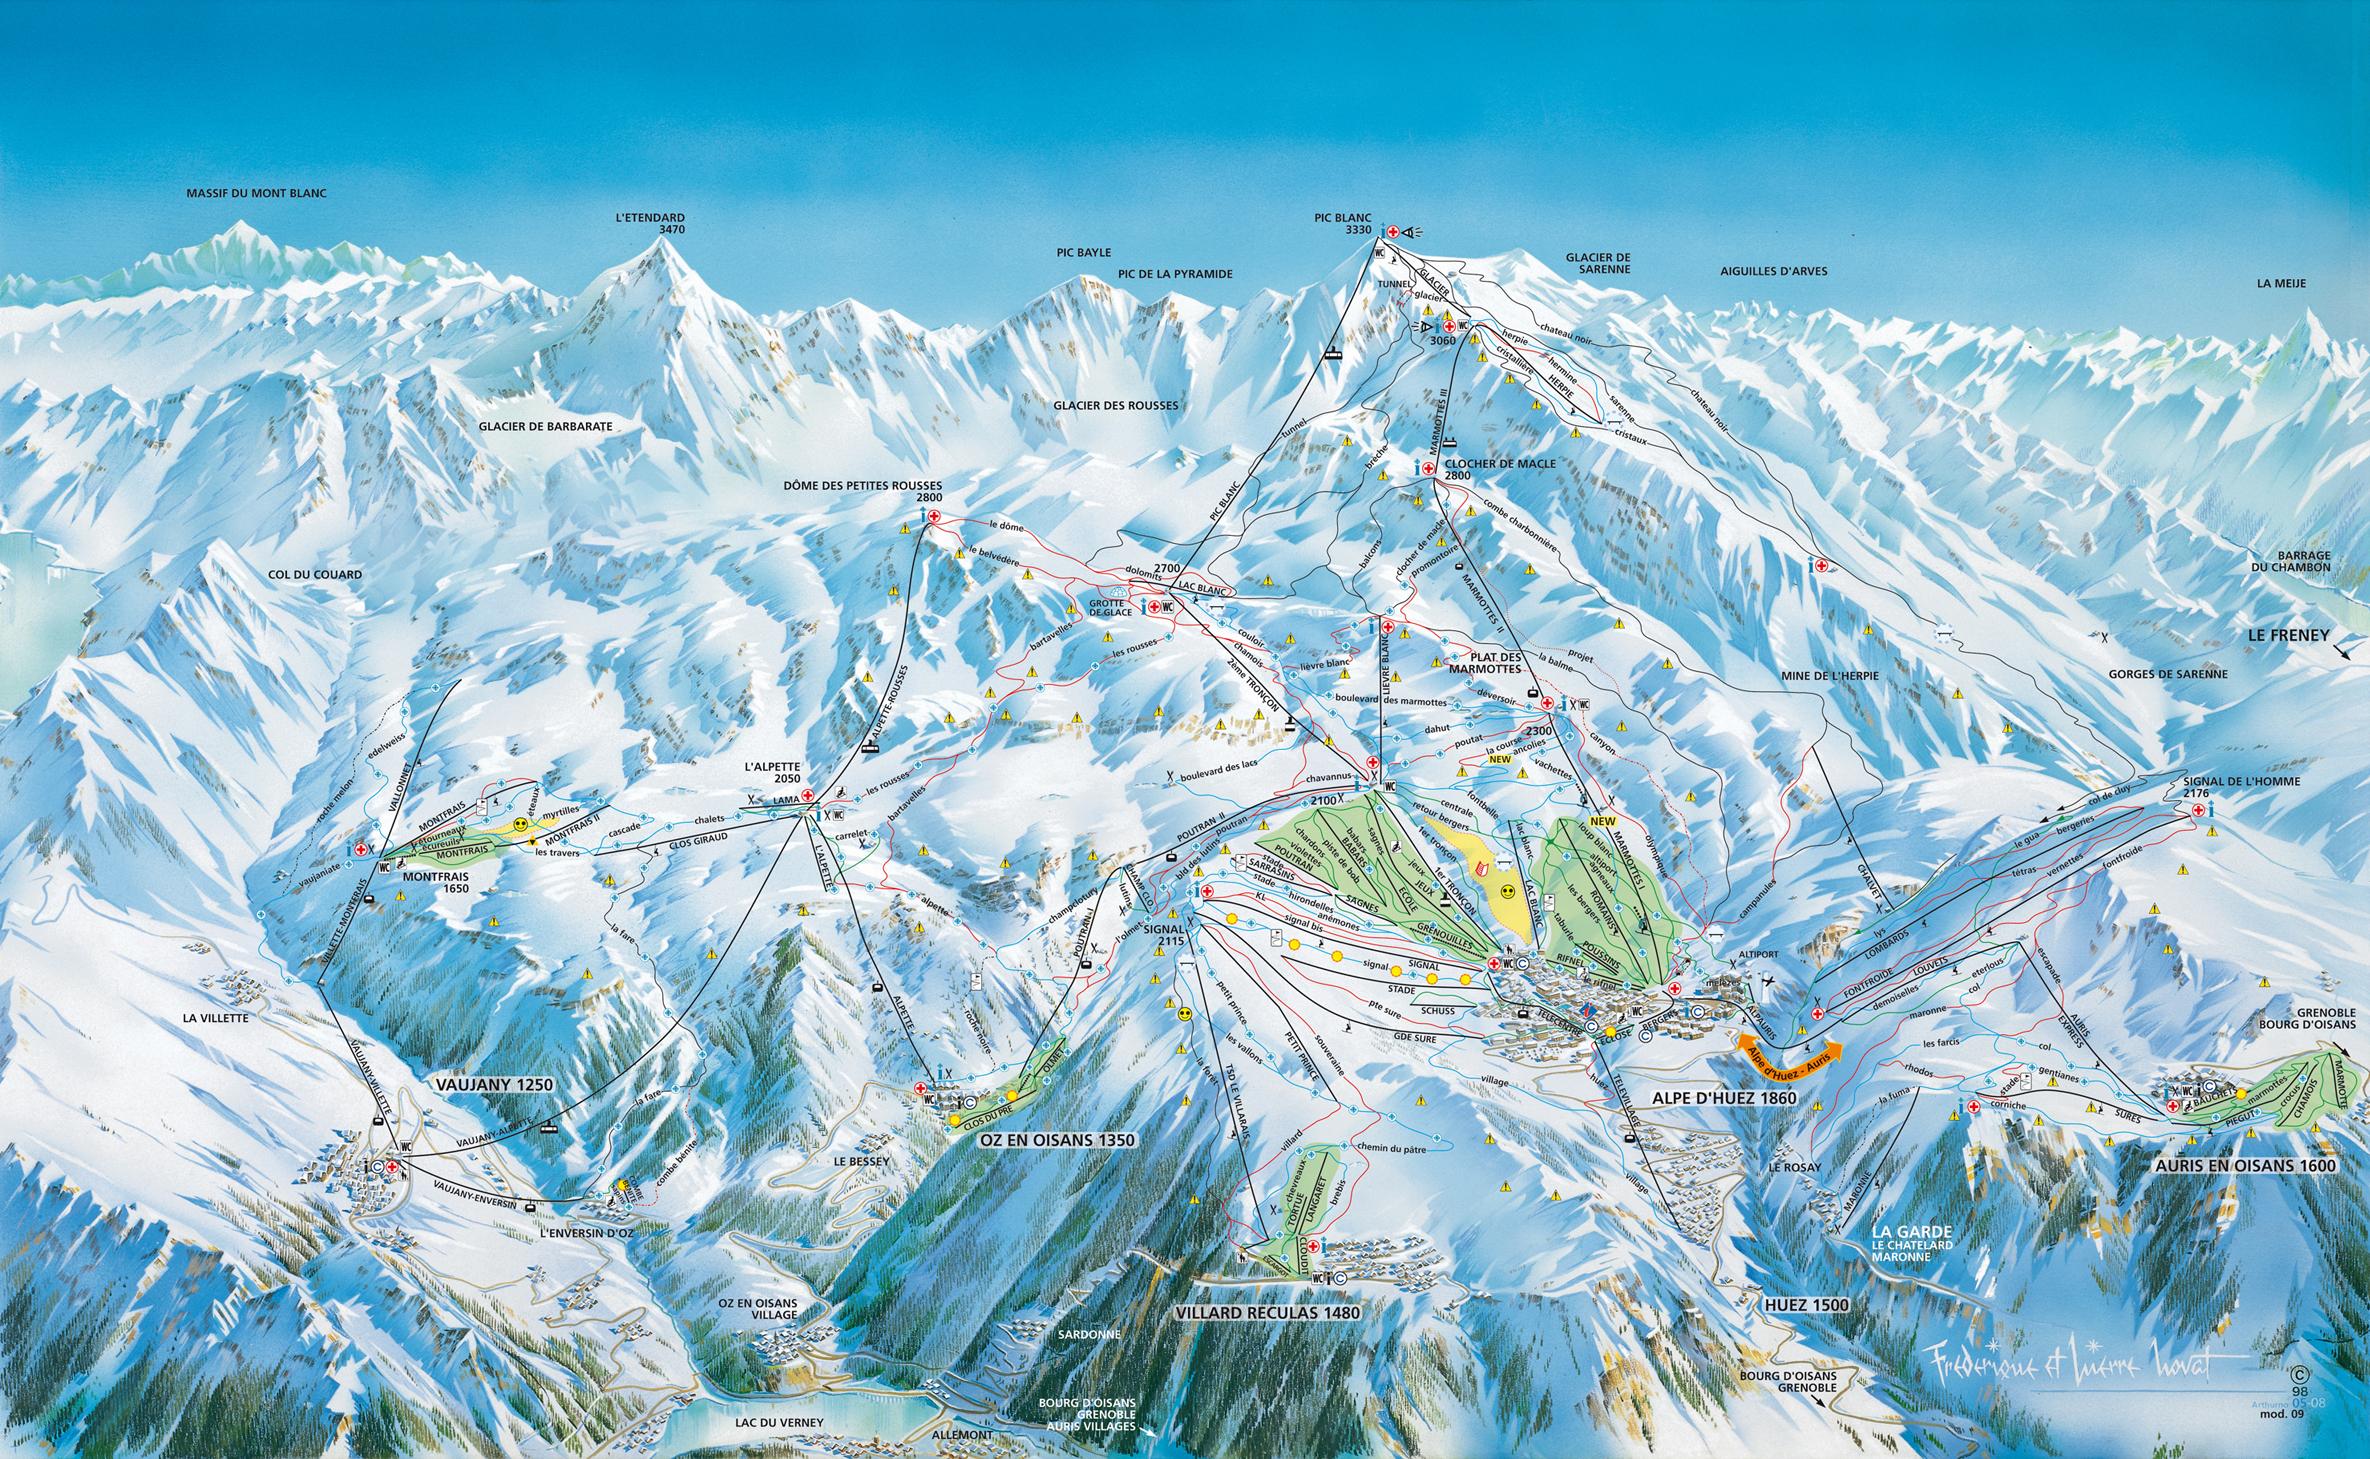 Domaine skiable alpin ski nordique vaujany plan des pistes vaujany planeteski - Office du tourisme alpe d huez ...